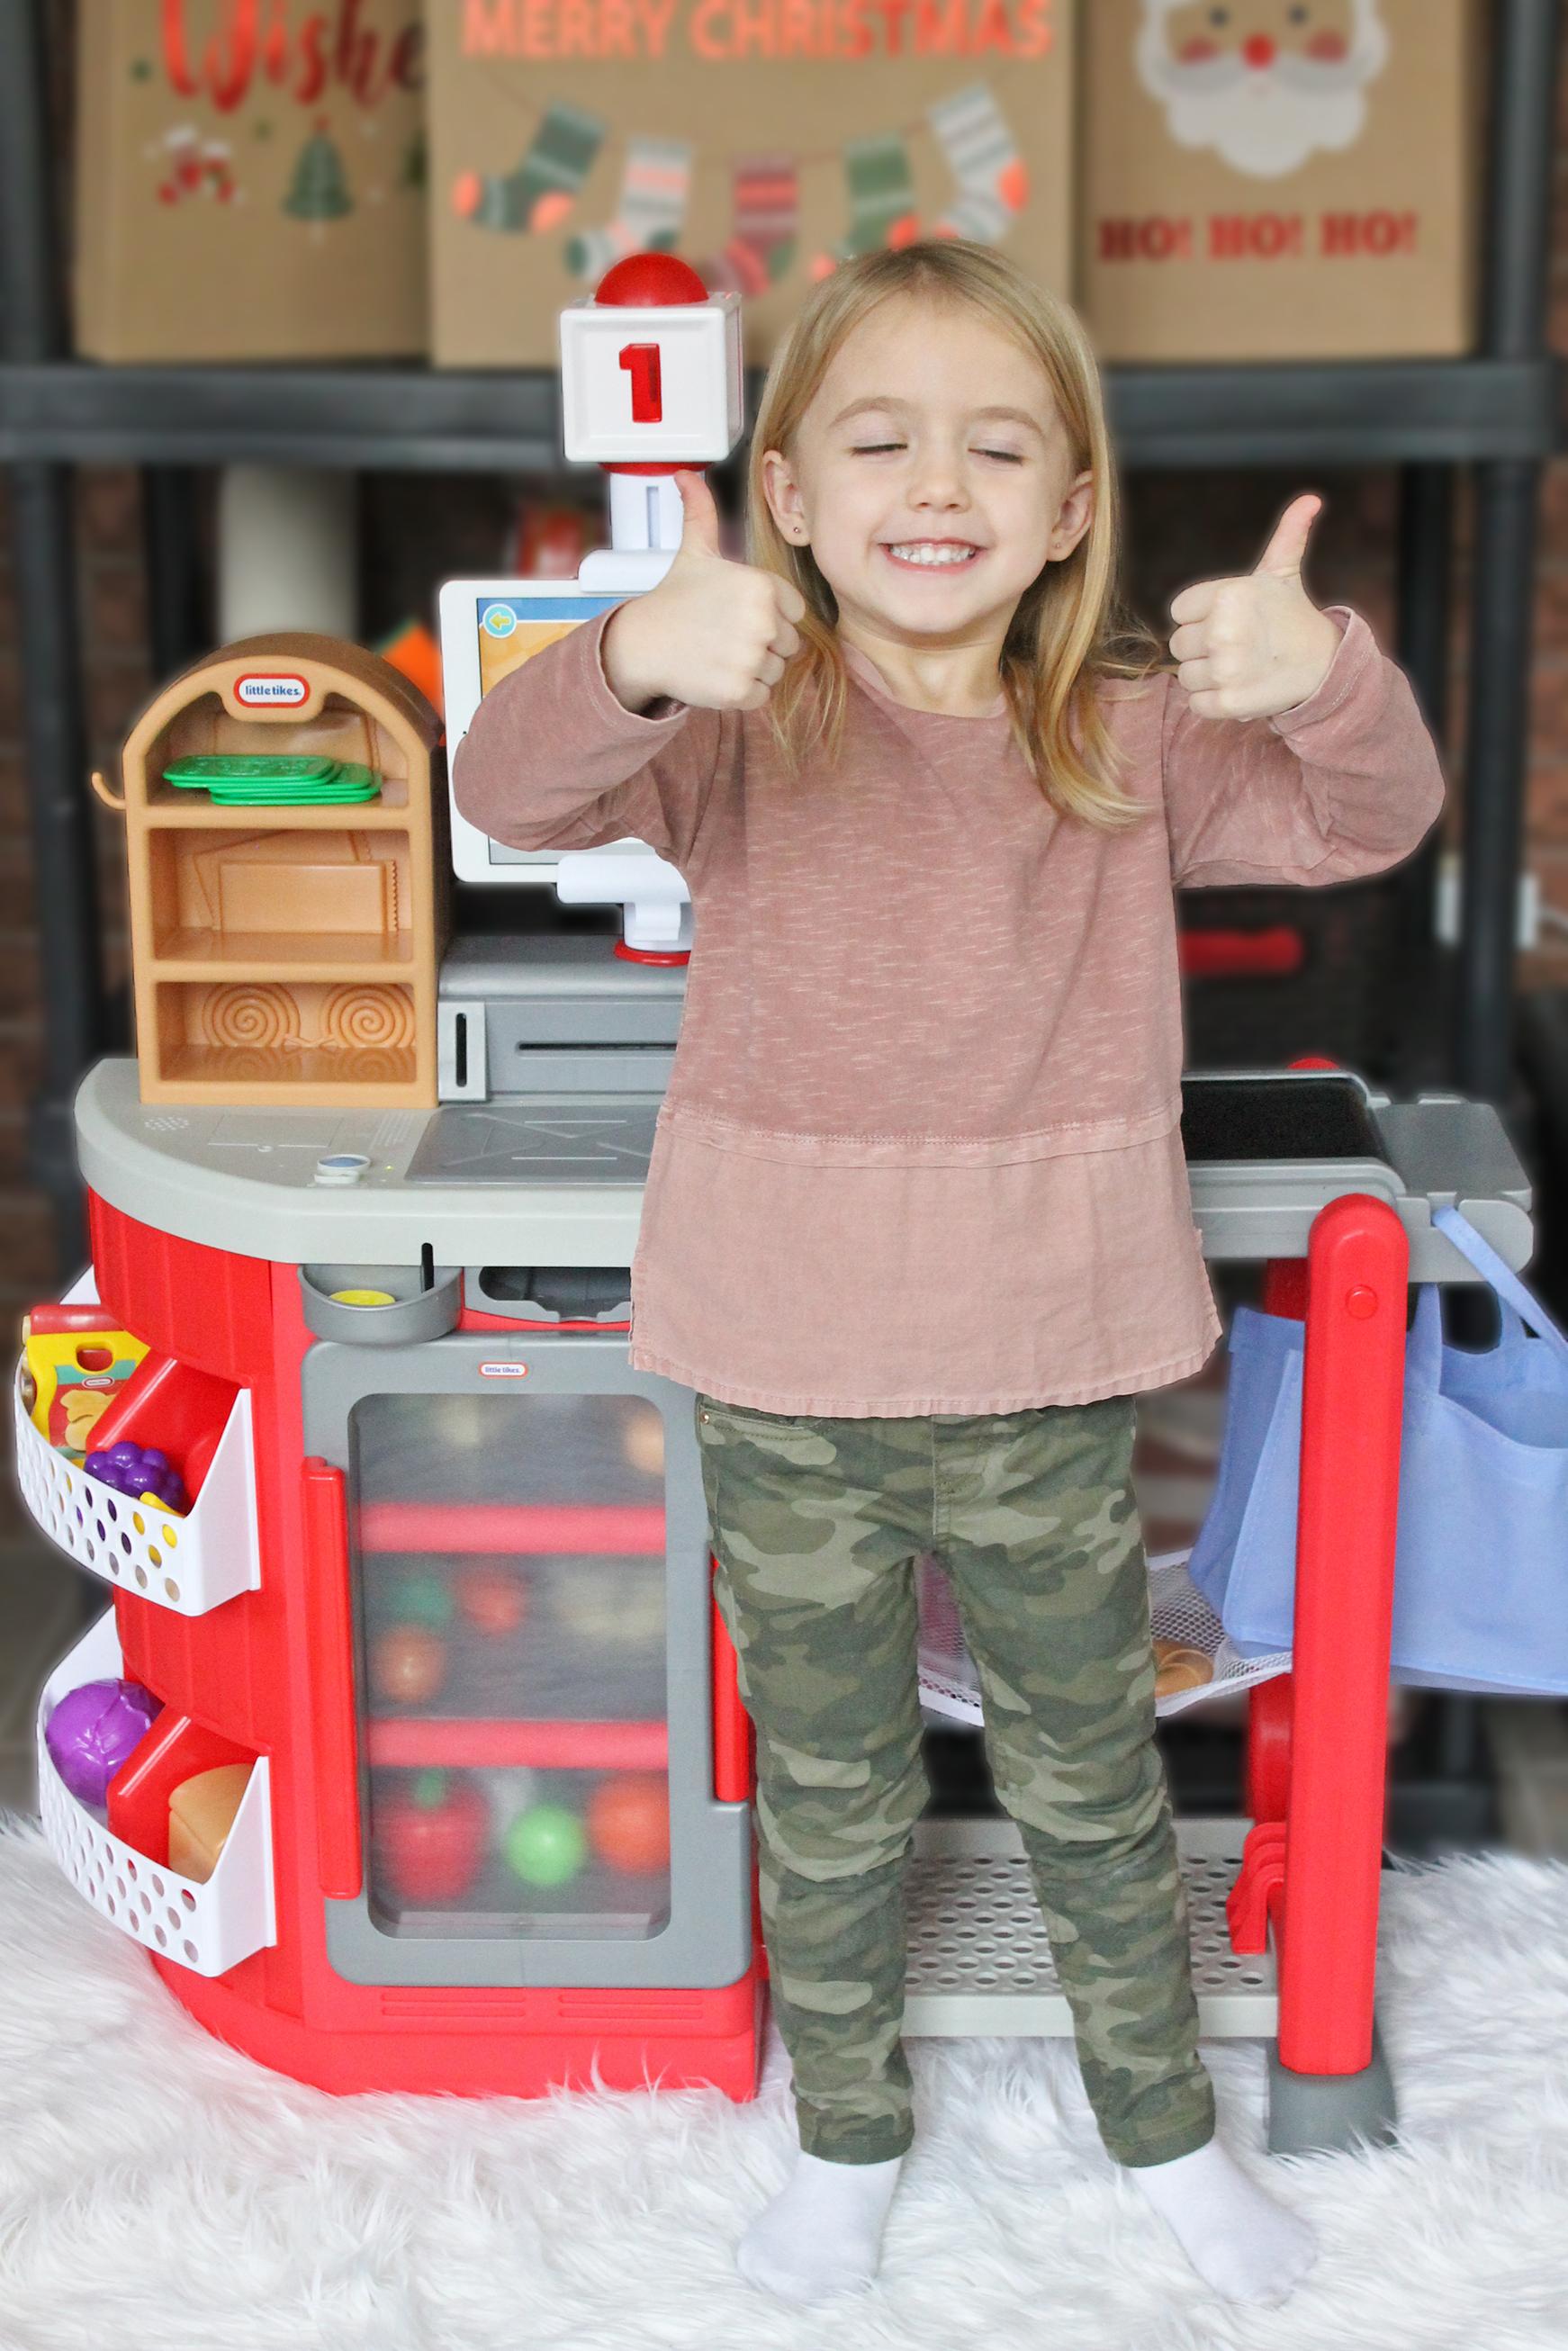 Little Tikes Shop n' Learn Smart Checkout